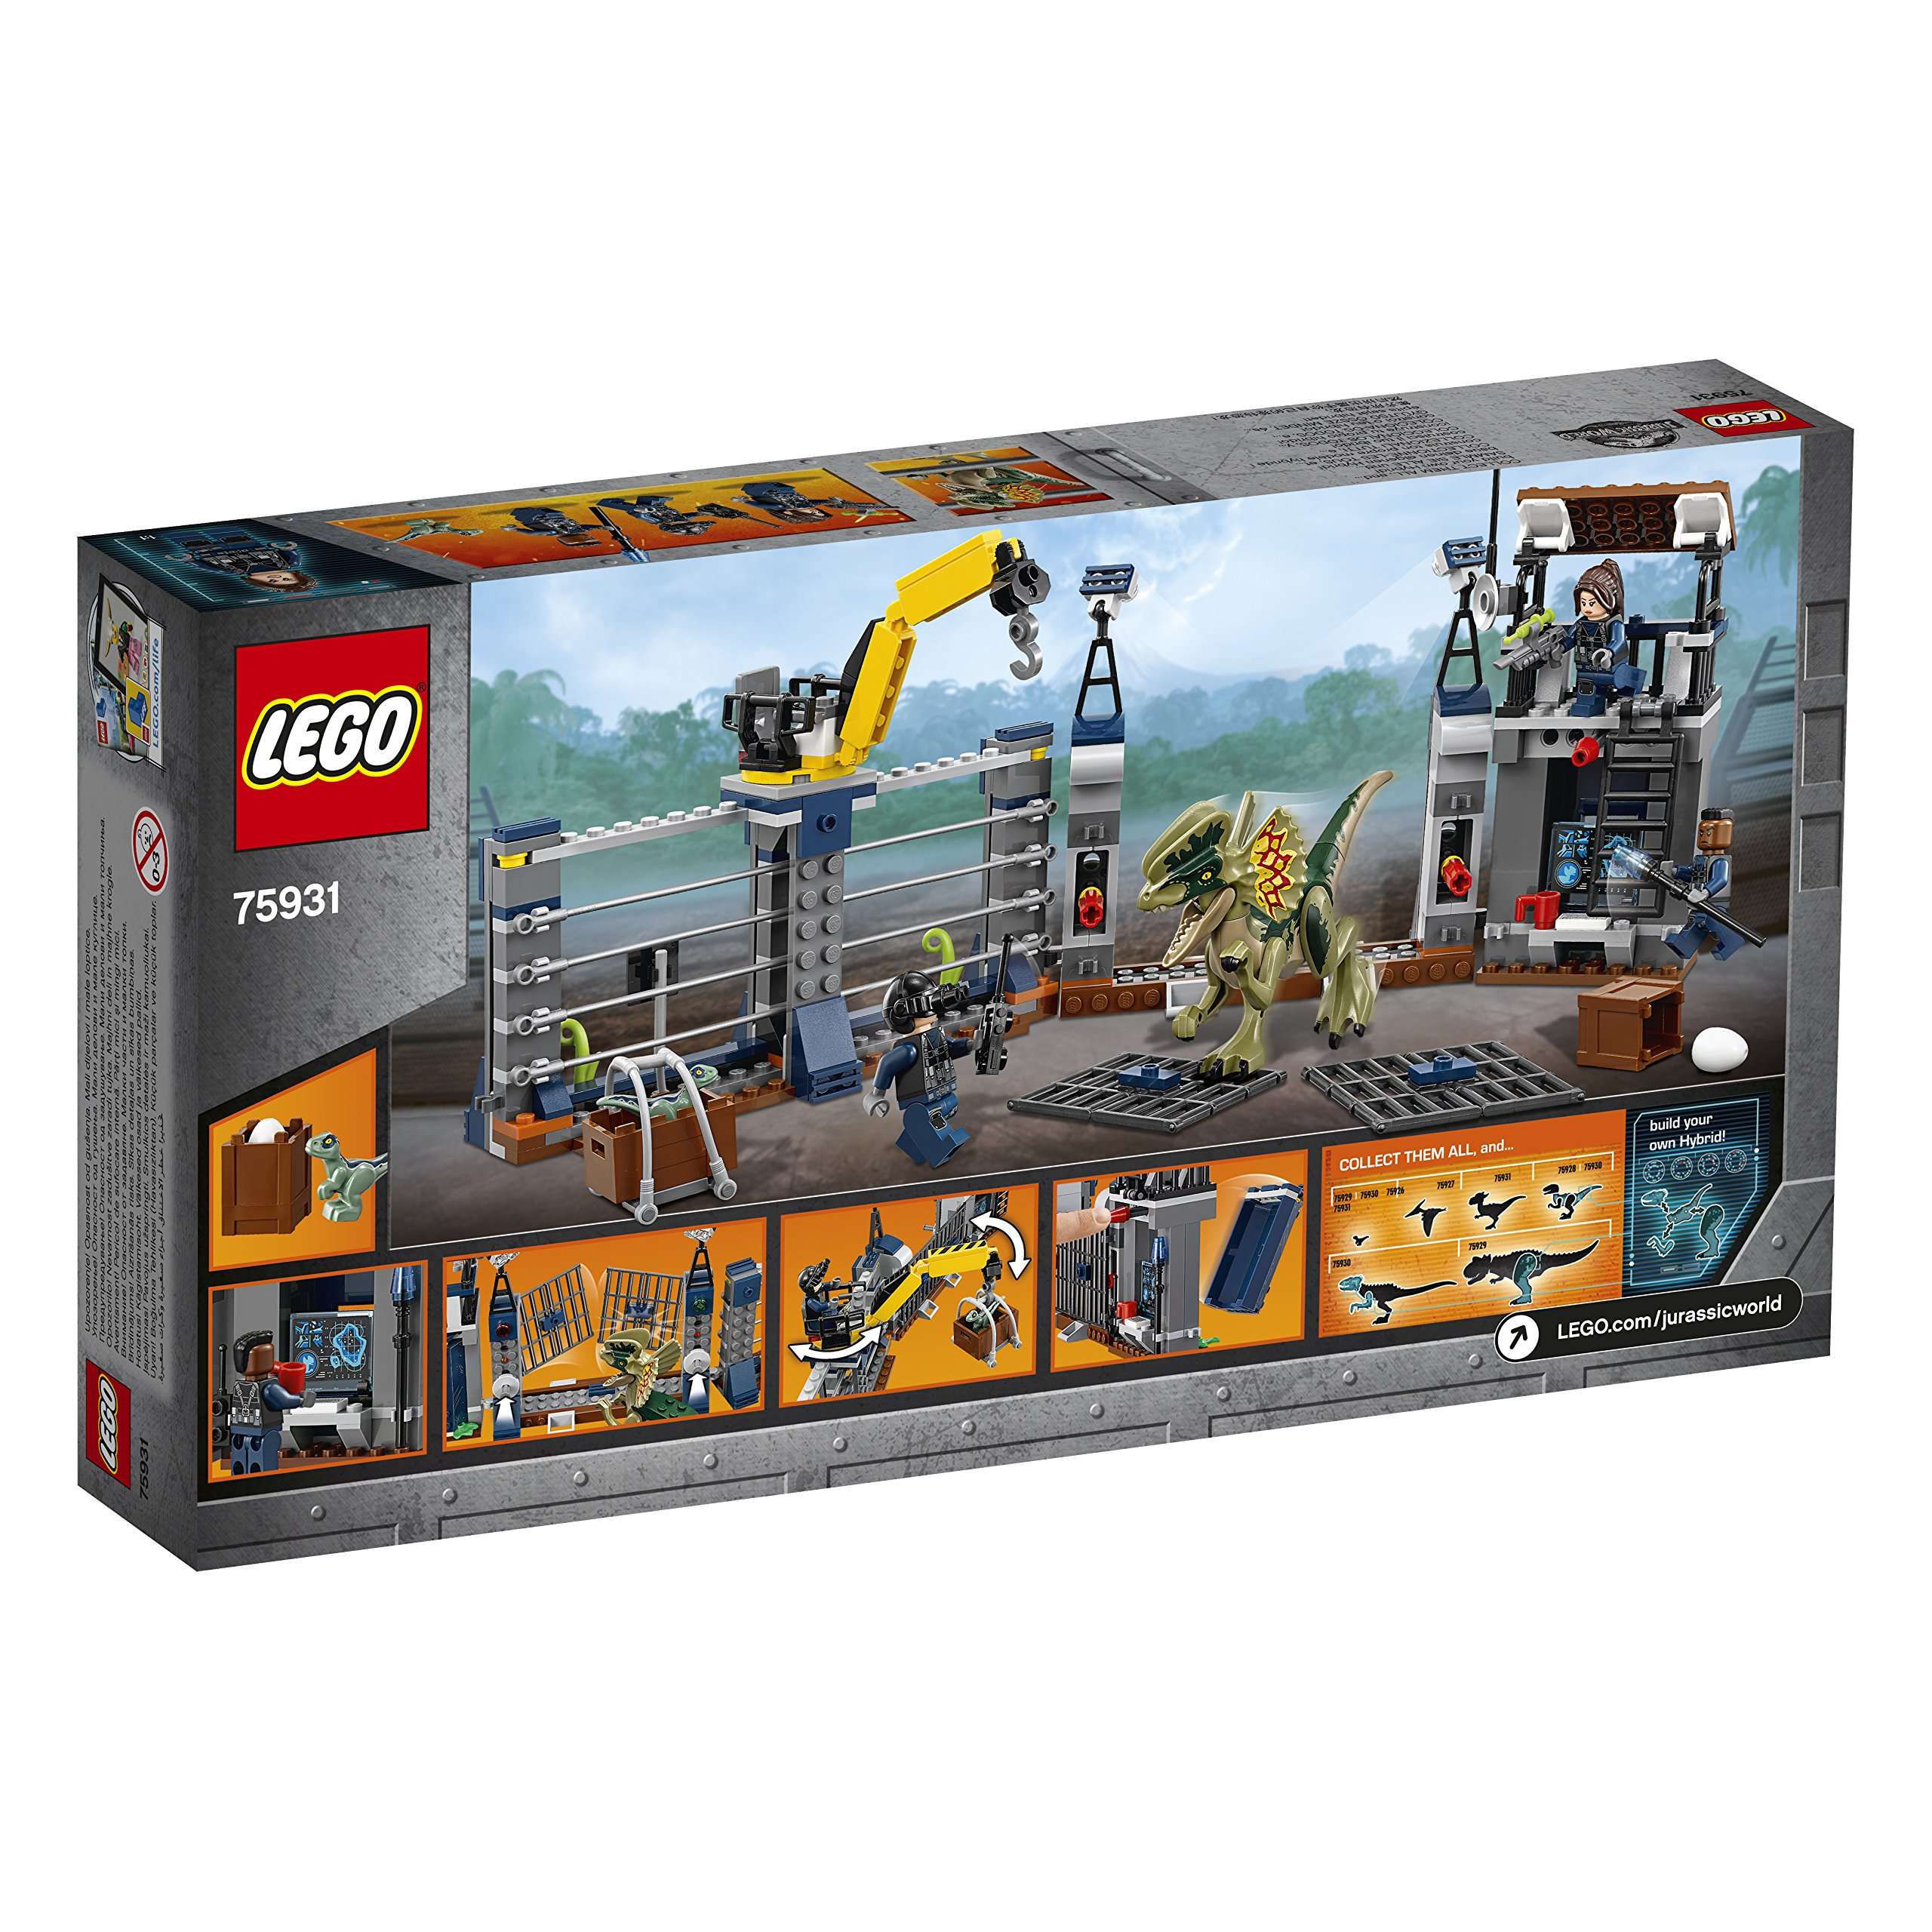 LEGO 75931 Jurassic World Dilophosaurus Outpost Attack Playset, Dinosaur Figures, Build & Play Dinosaur Toys for Kids by LEGO (Image #4)